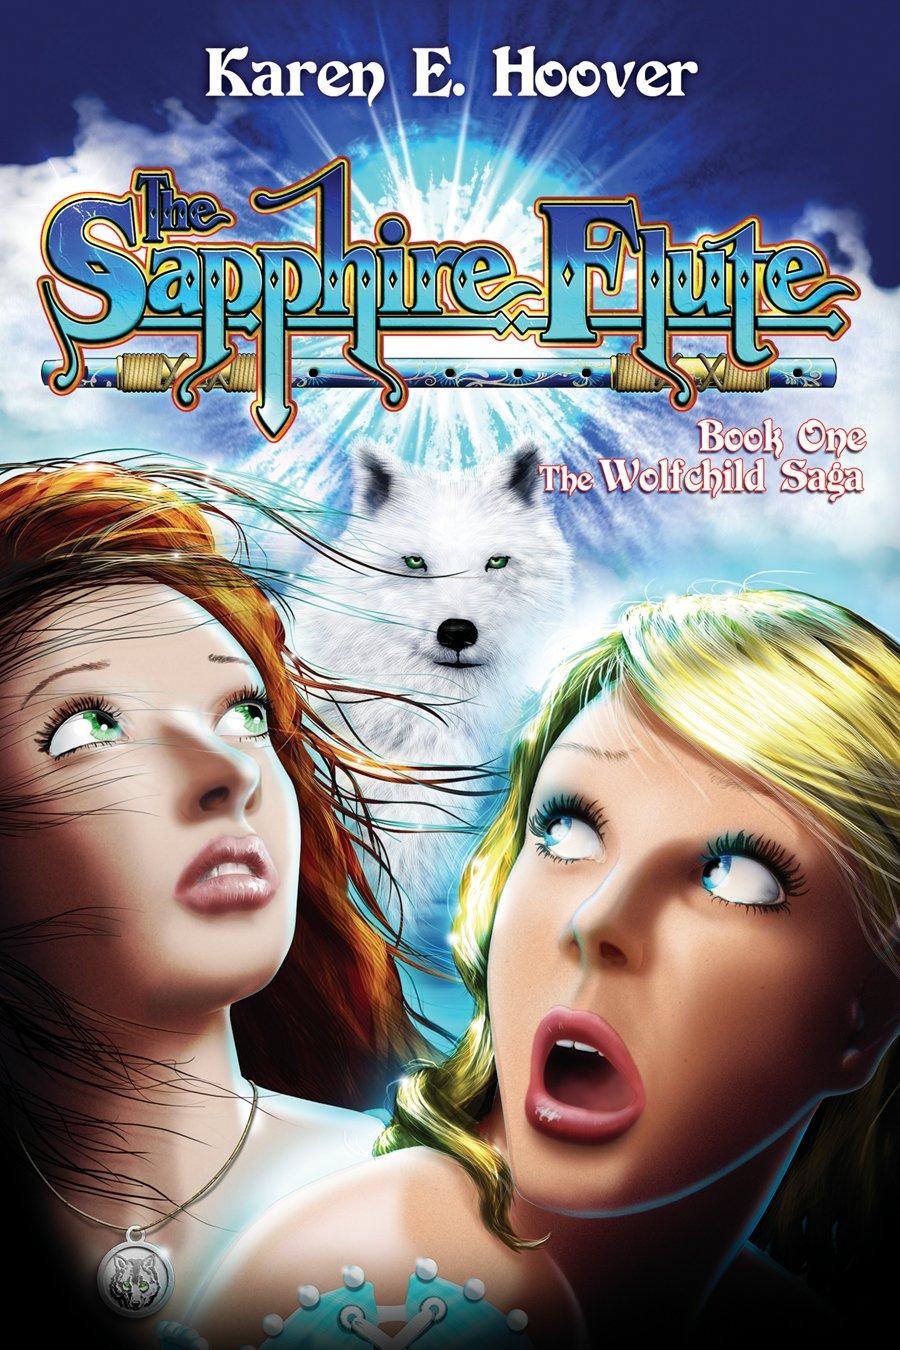 Read Online The Sapphire Flute (Book 1 - The Wolfchild Saga) pdf